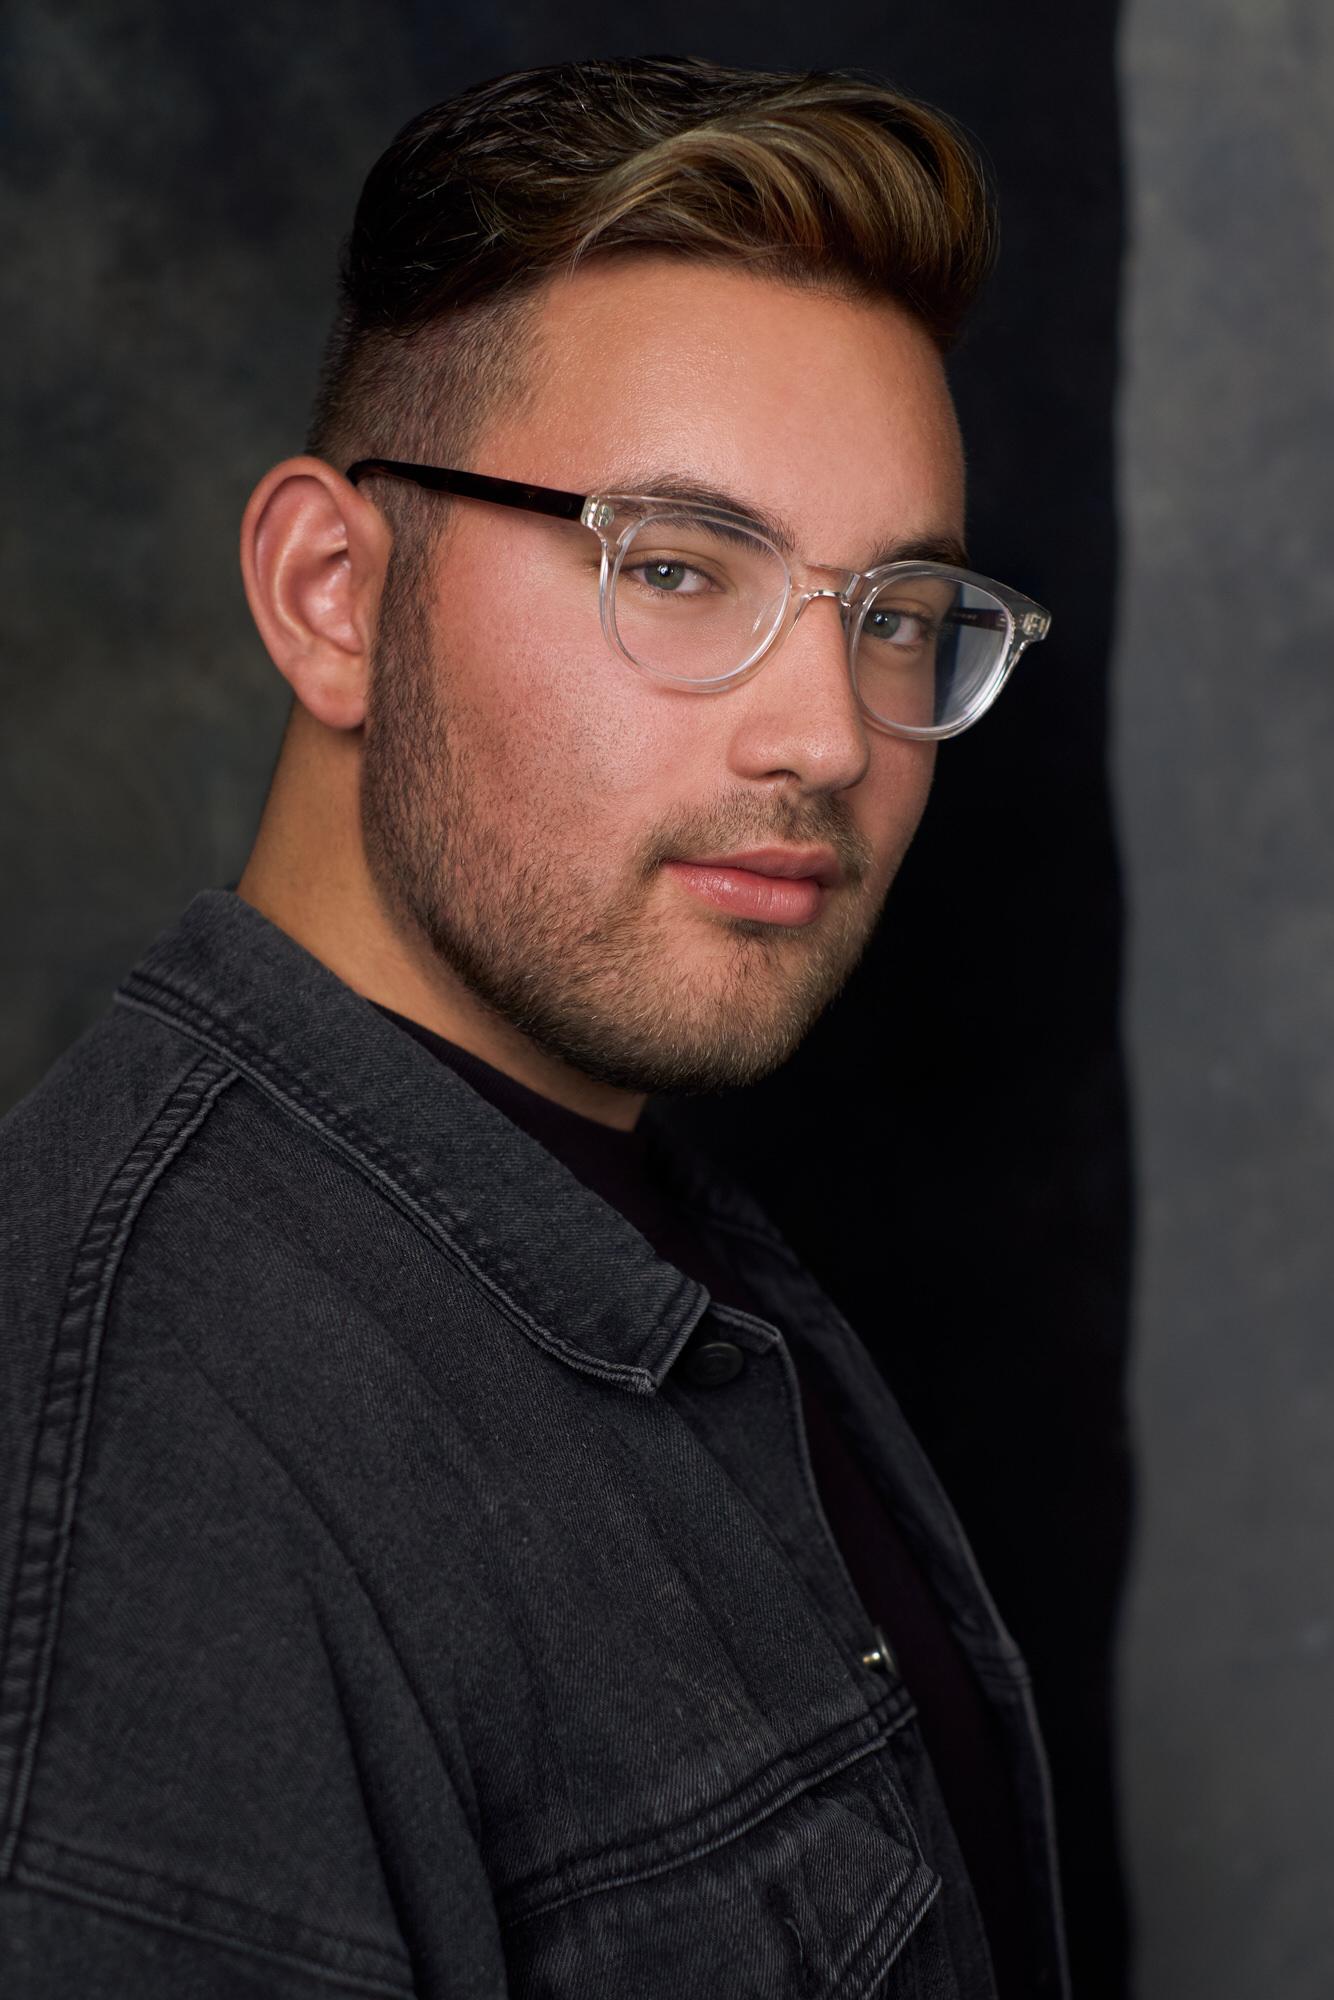 Sage Jepson - -Ryan-Parker-Photography-Edmonton-Headshots-Alberta-Headshot-Portrait-Photographer-Corporate-Actor-Business-Professional-Acting-Studio-Calgary.jpg